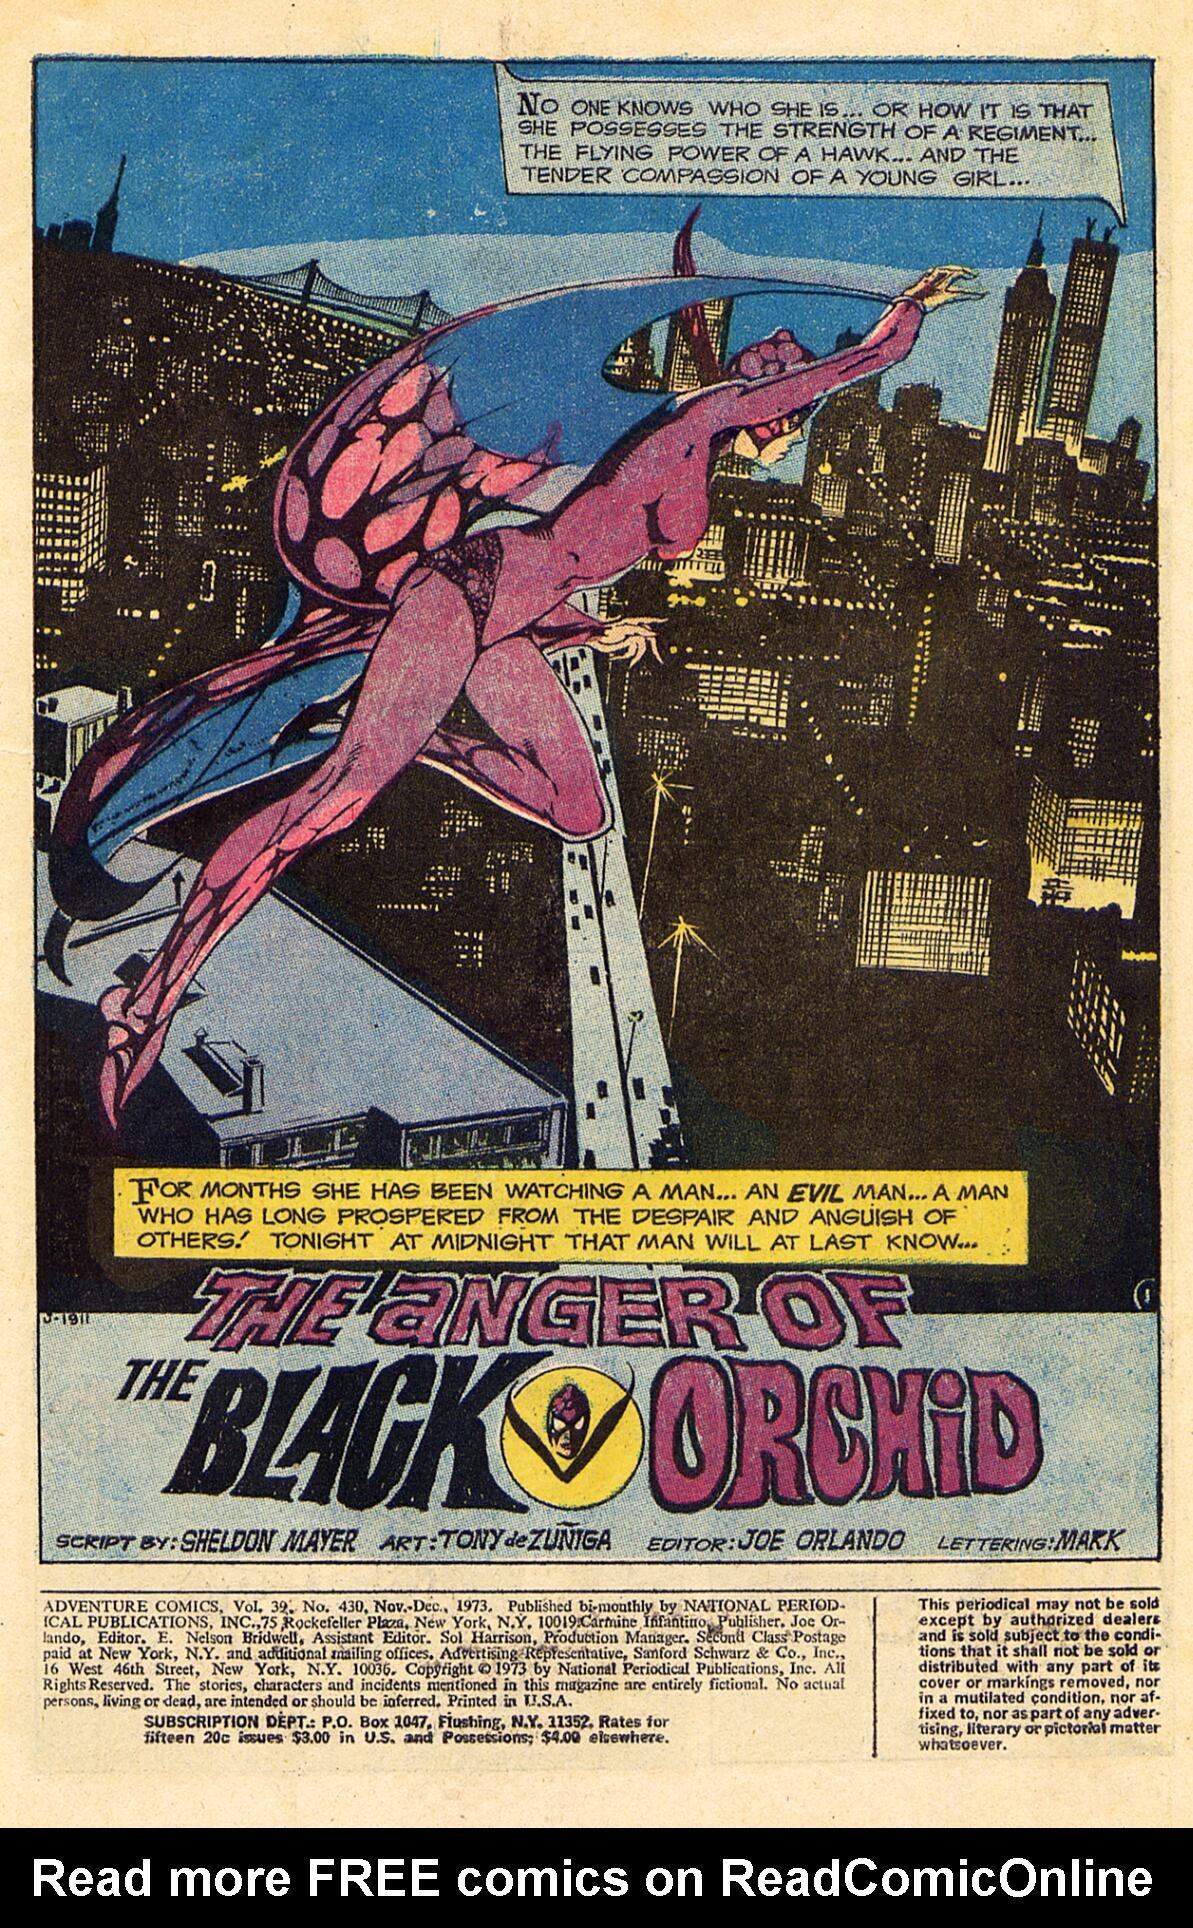 Read online Adventure Comics (1938) comic -  Issue #430 - 3